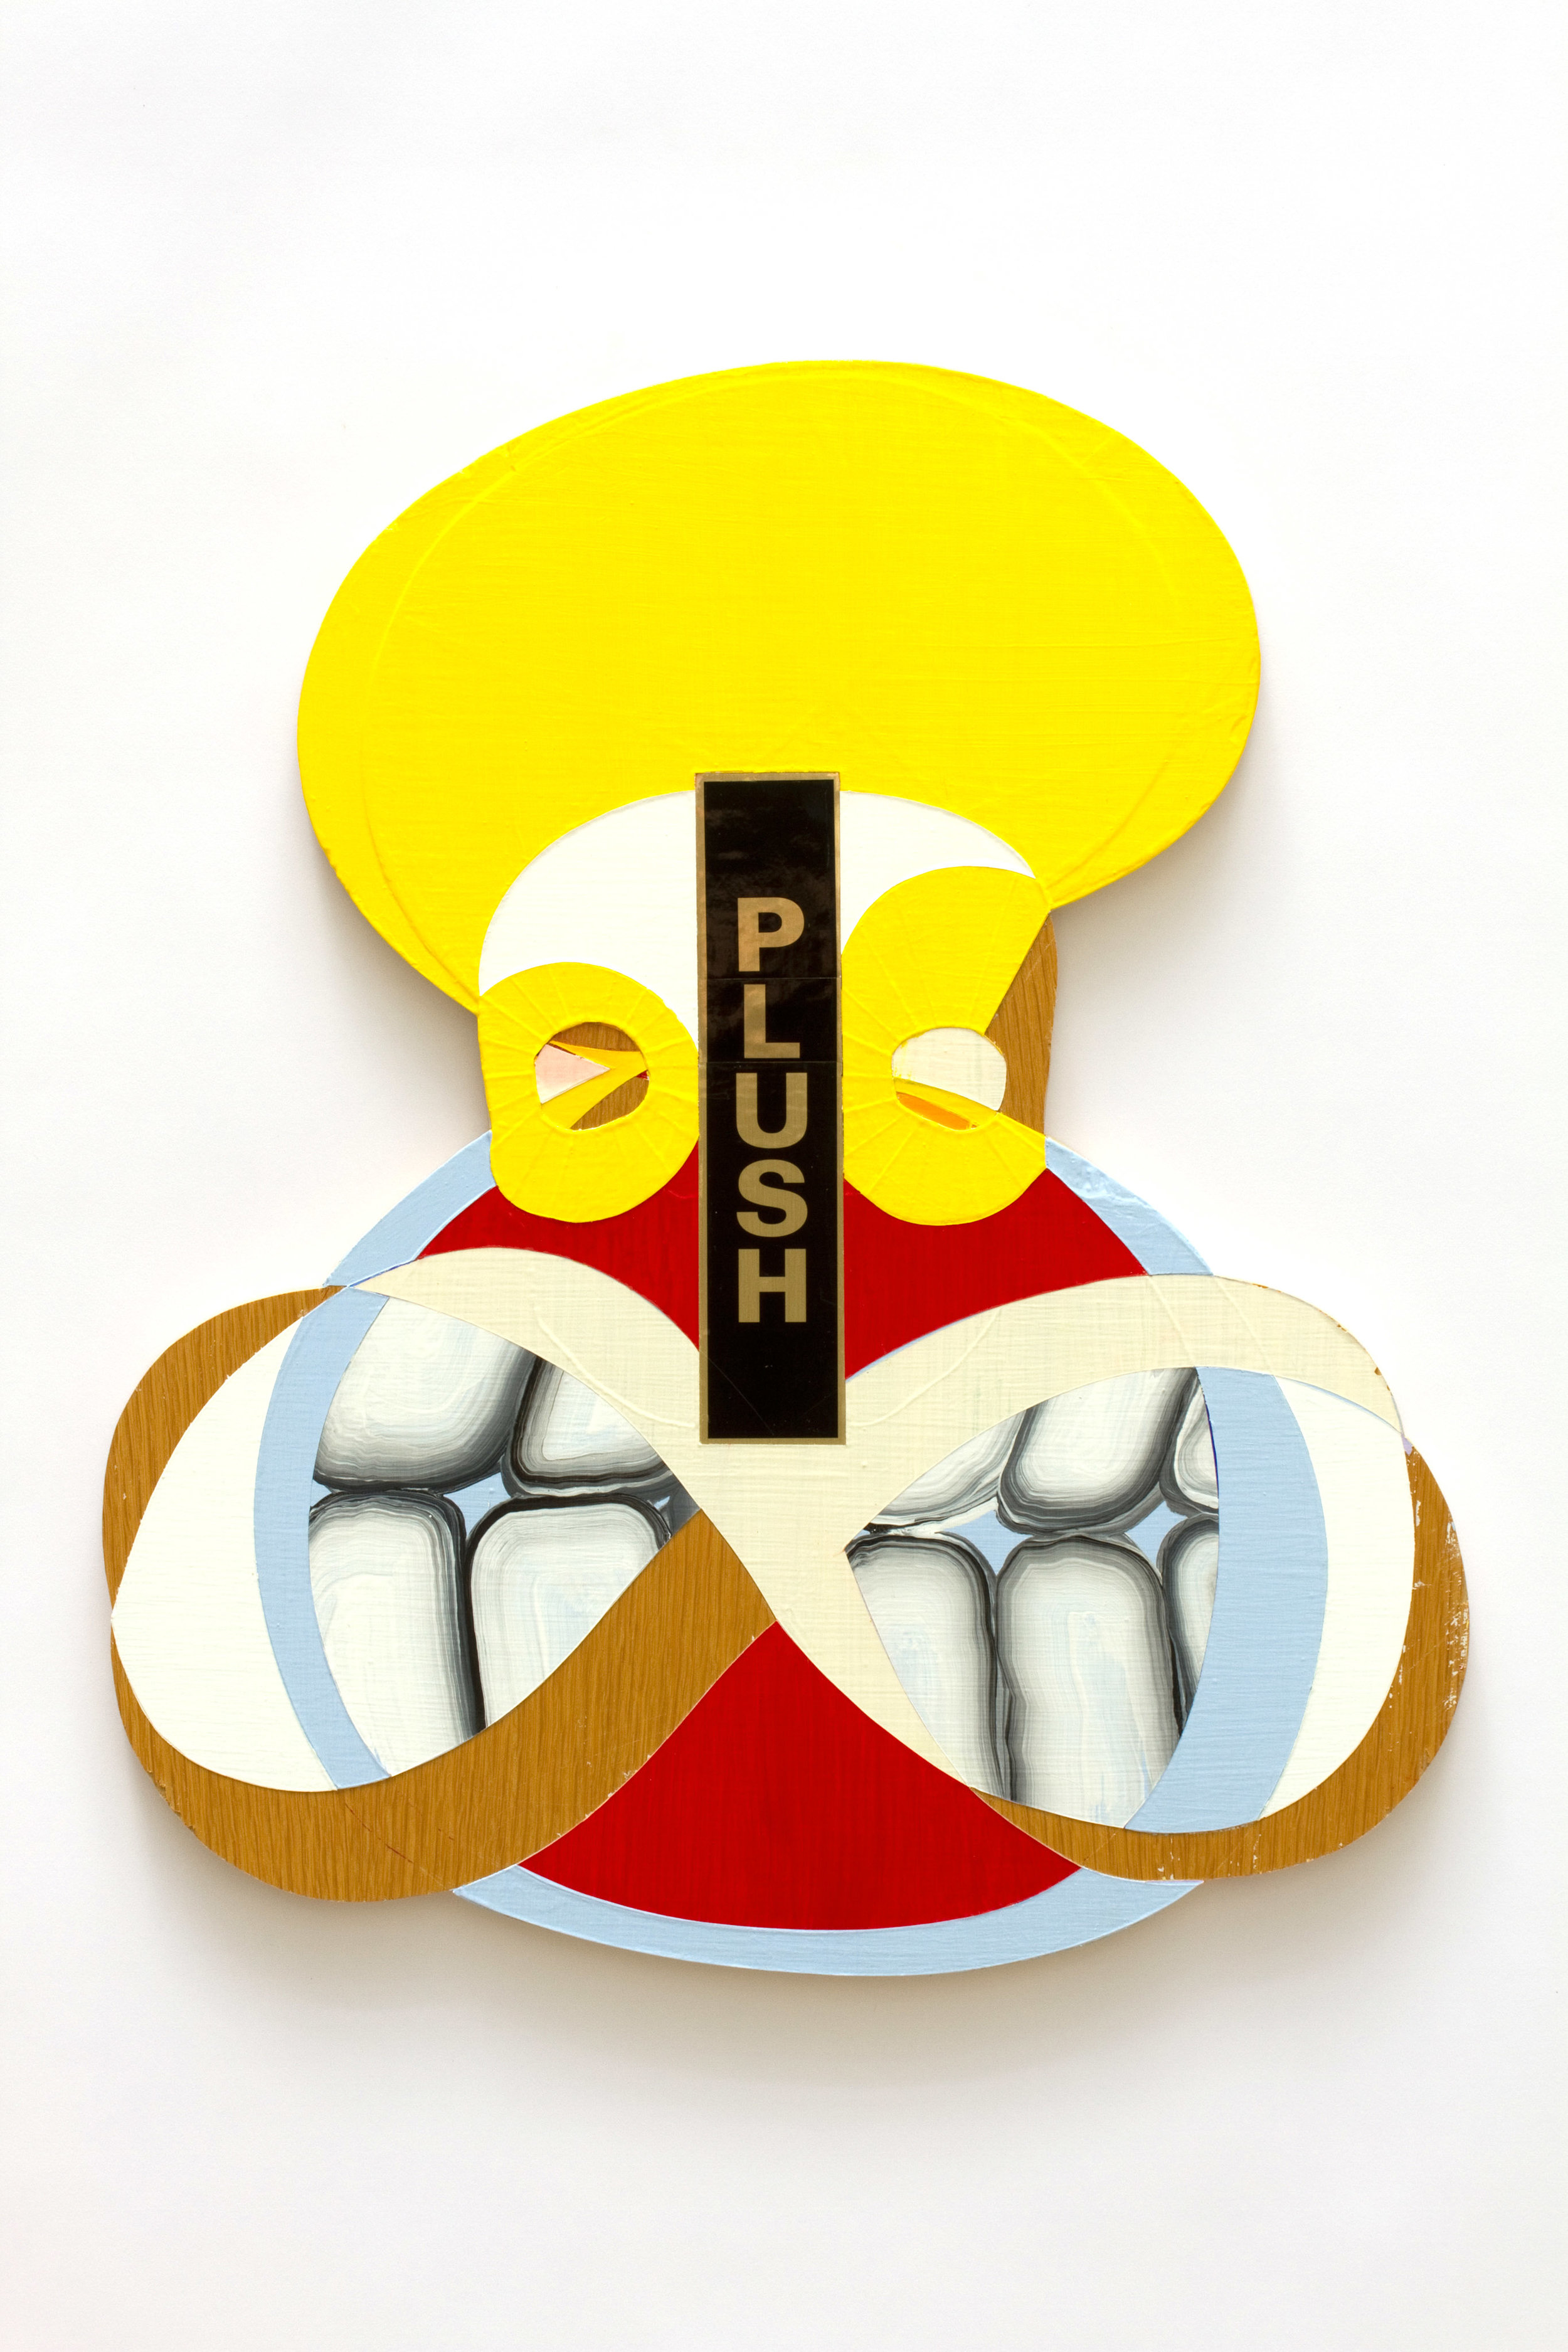 Plush, 2011